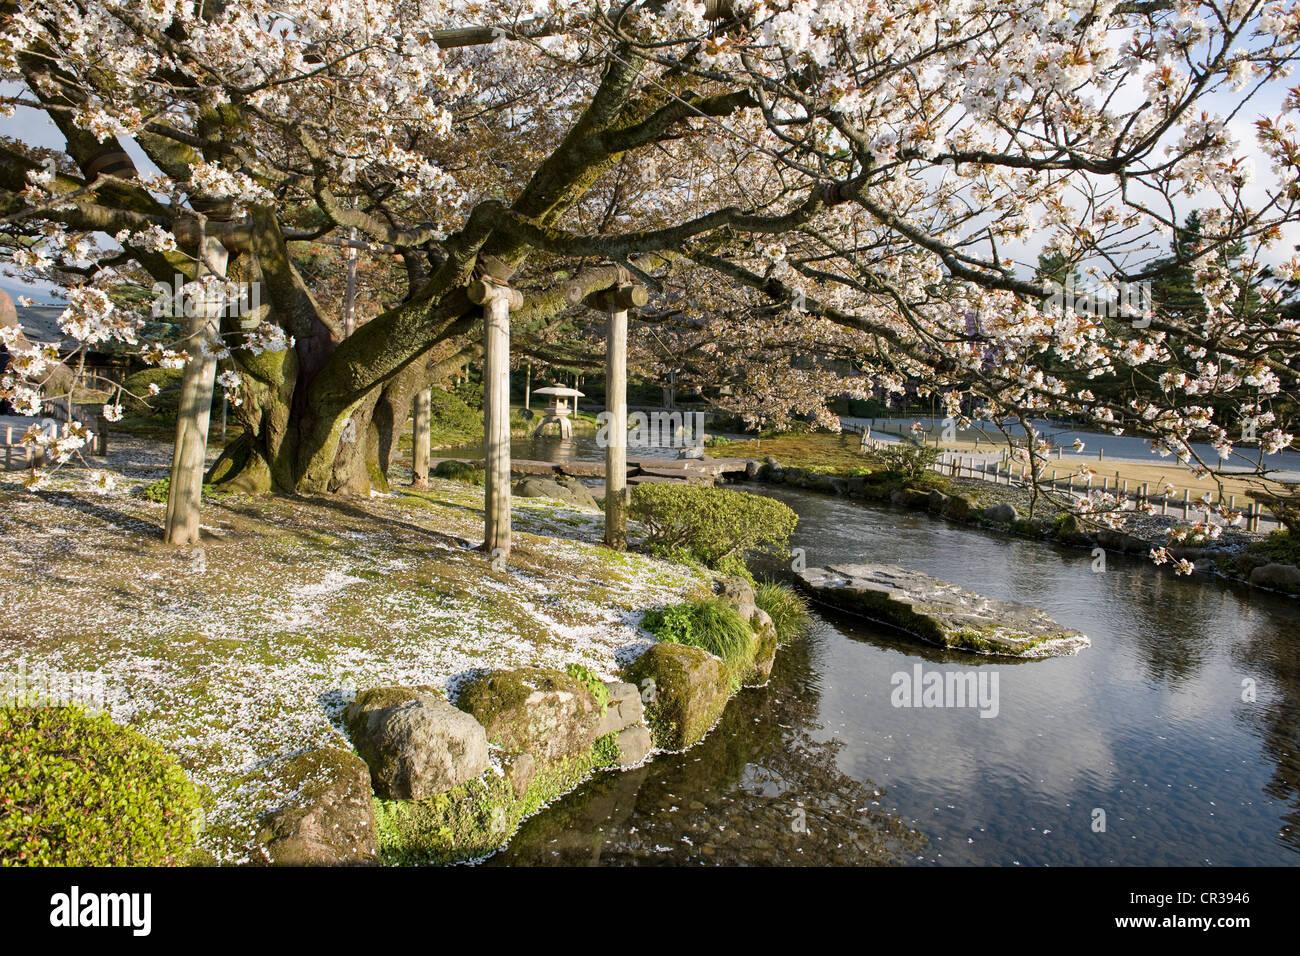 Japan, Honshu Island, Chubu Region, Kanazawa, the Kenroku En Garden - Stock Image